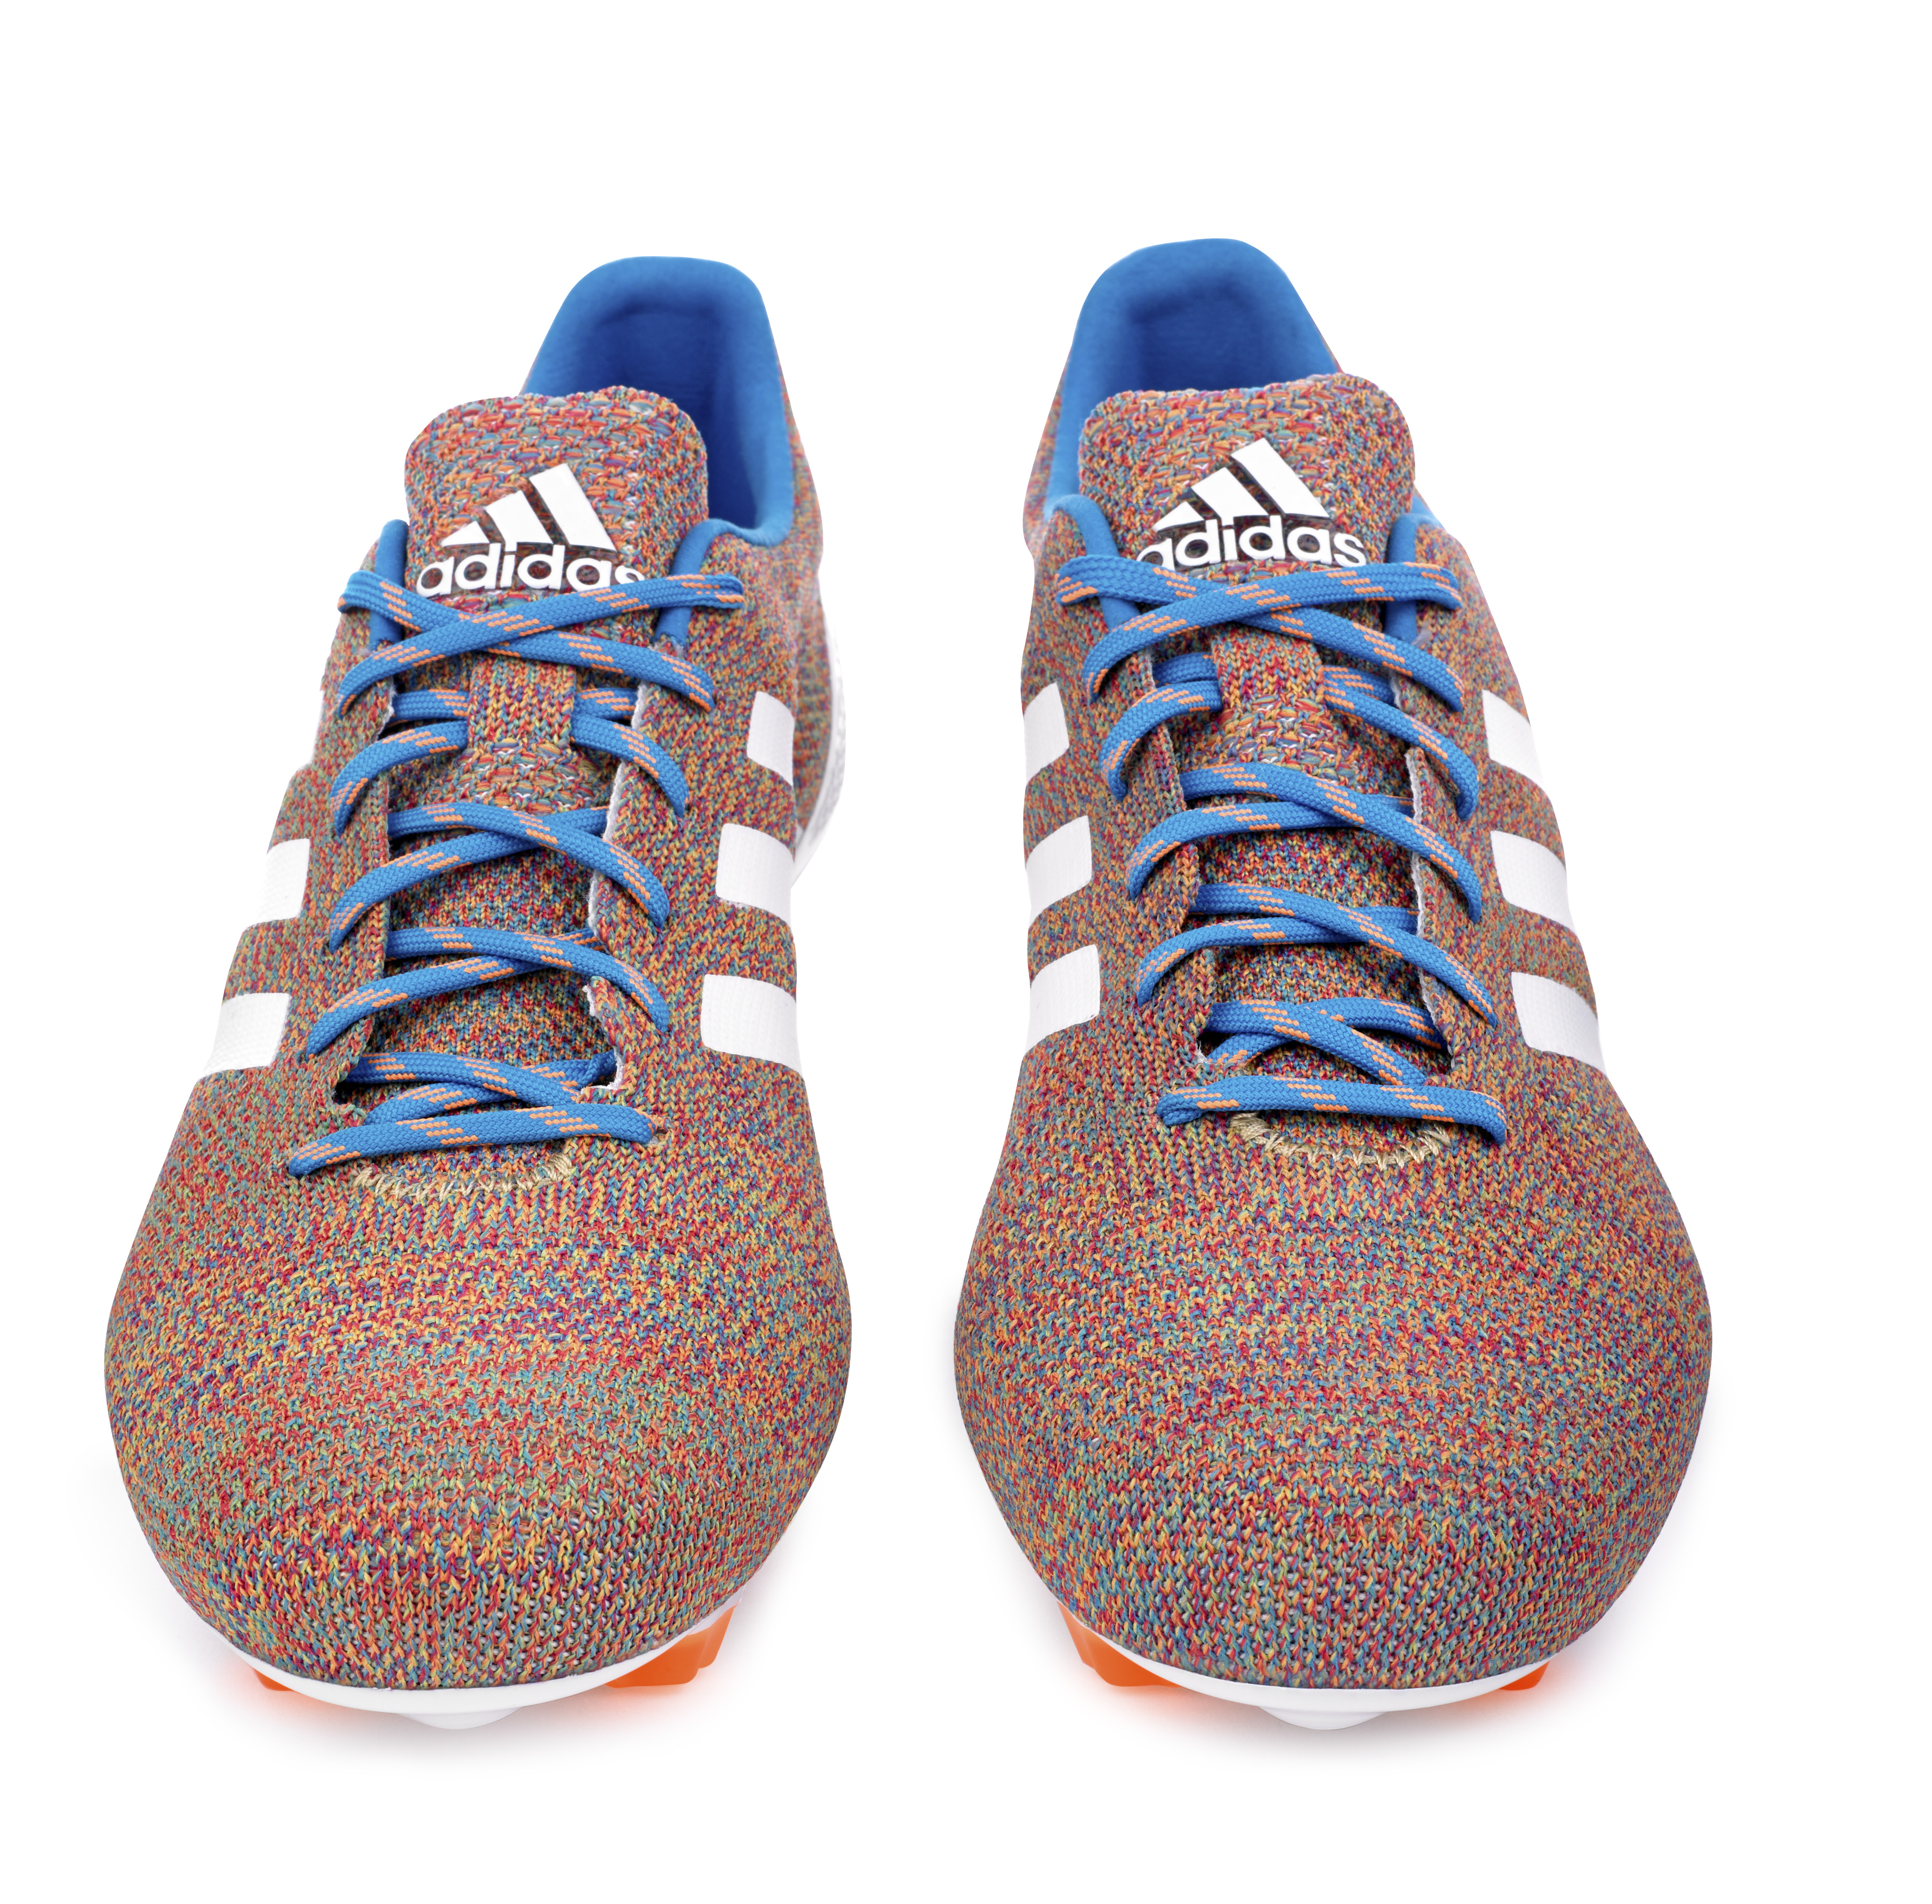 Adidas Samba on Feet Adidas Samba Primeknit